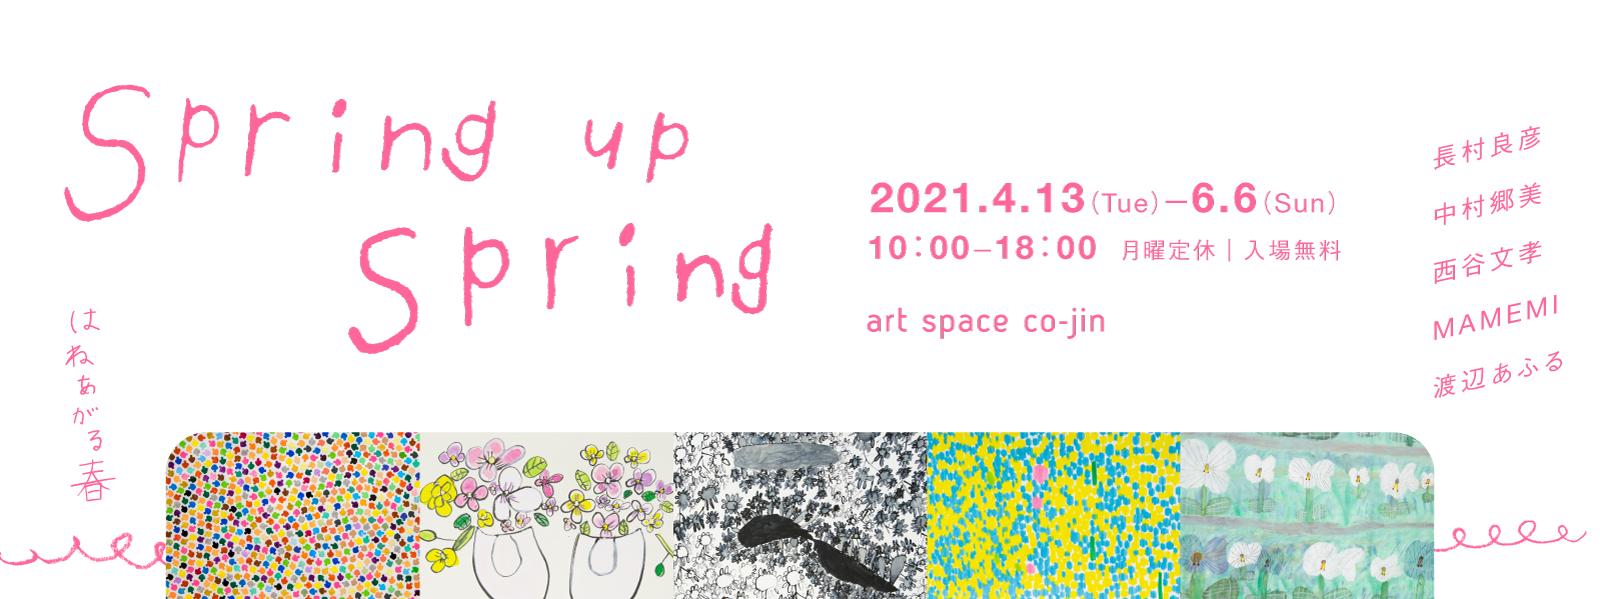 Spring up Spring 展 2021年4月13日(火)〜6月6日(日)※月曜休廊 10:00-18:00